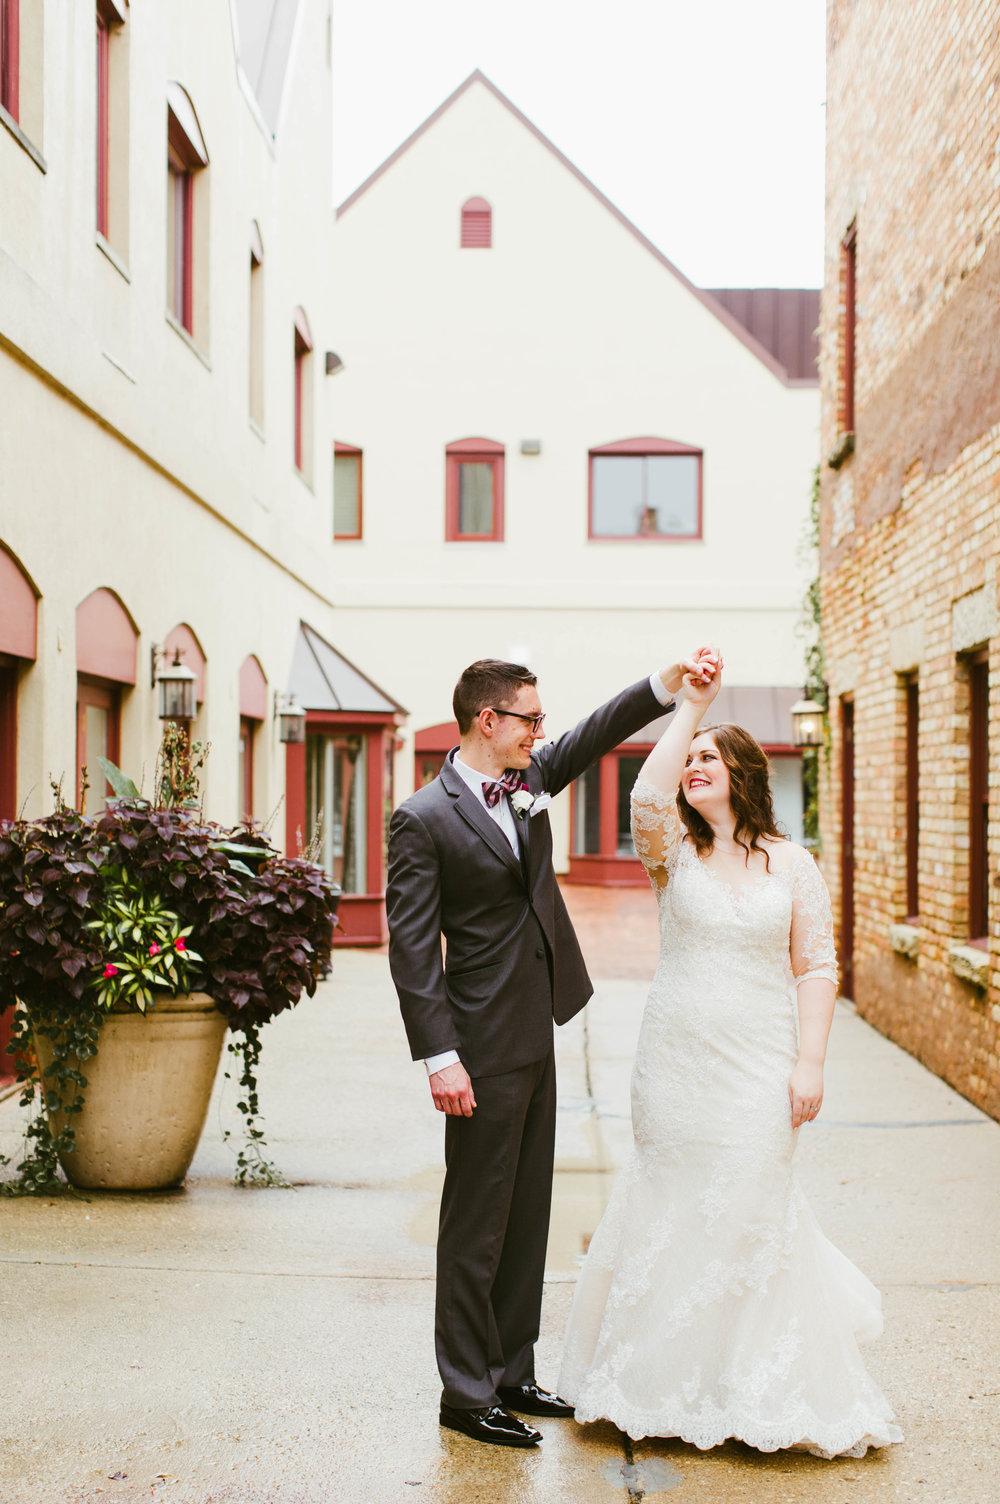 jennahazelphotography-marcy+ben-wedding-0578.jpg